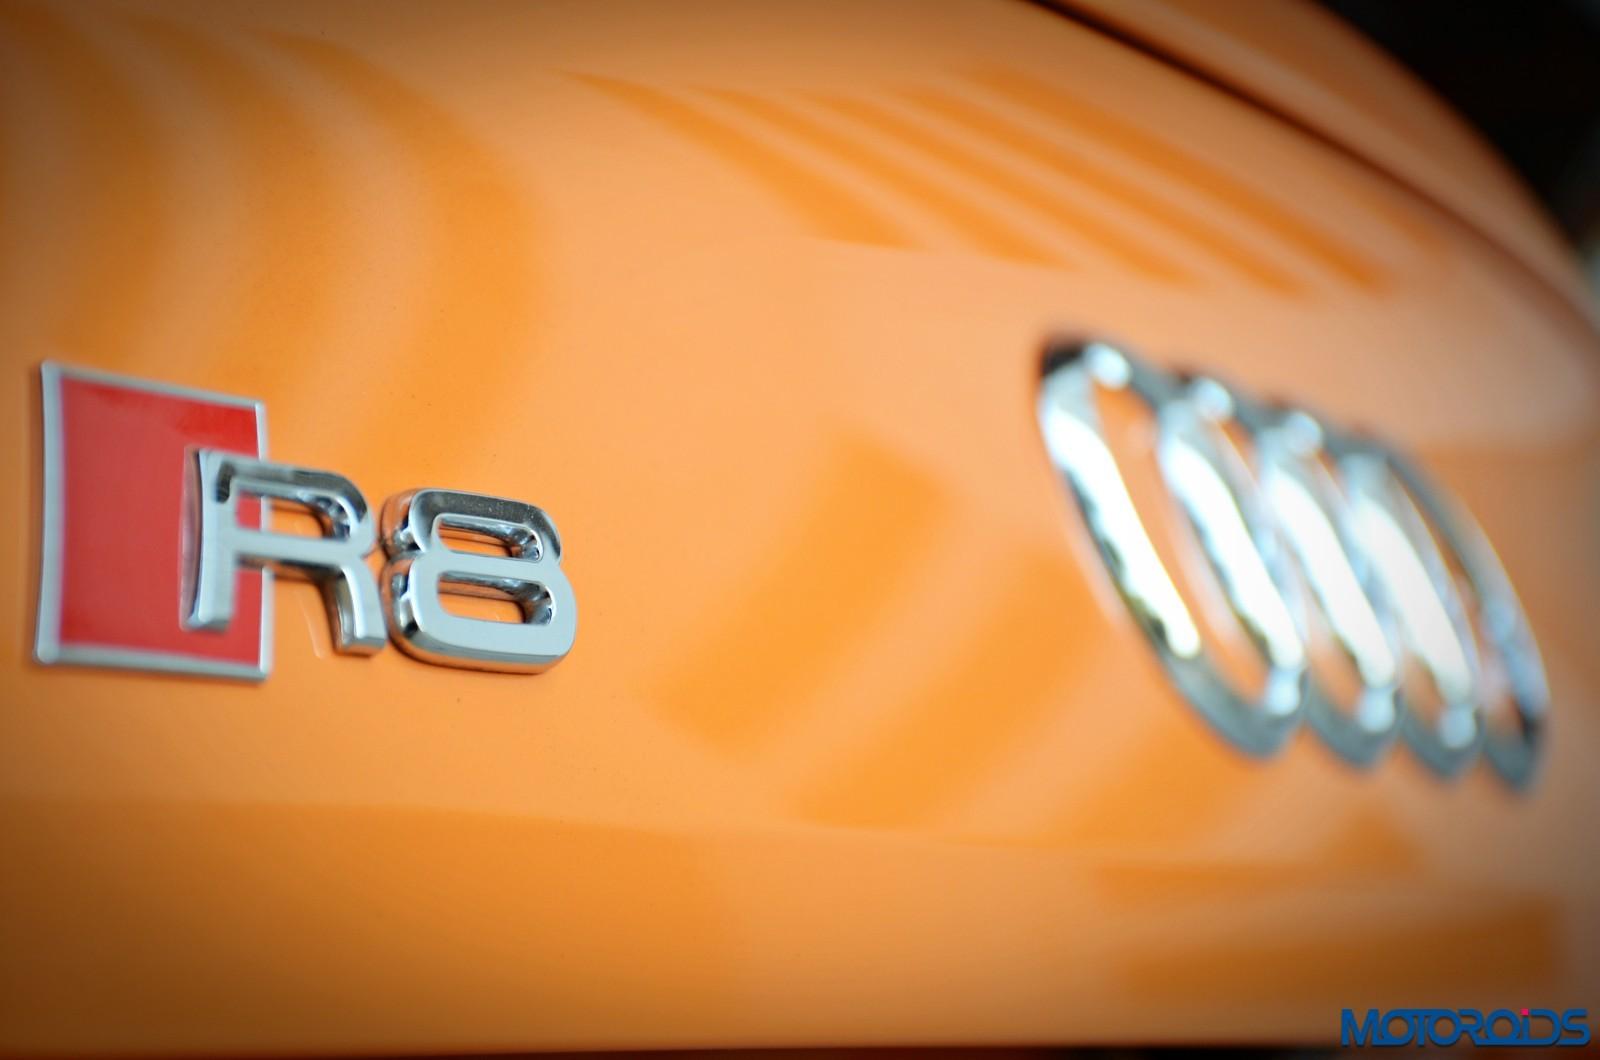 New-Audi-R8-V10-Plus-india-review-1